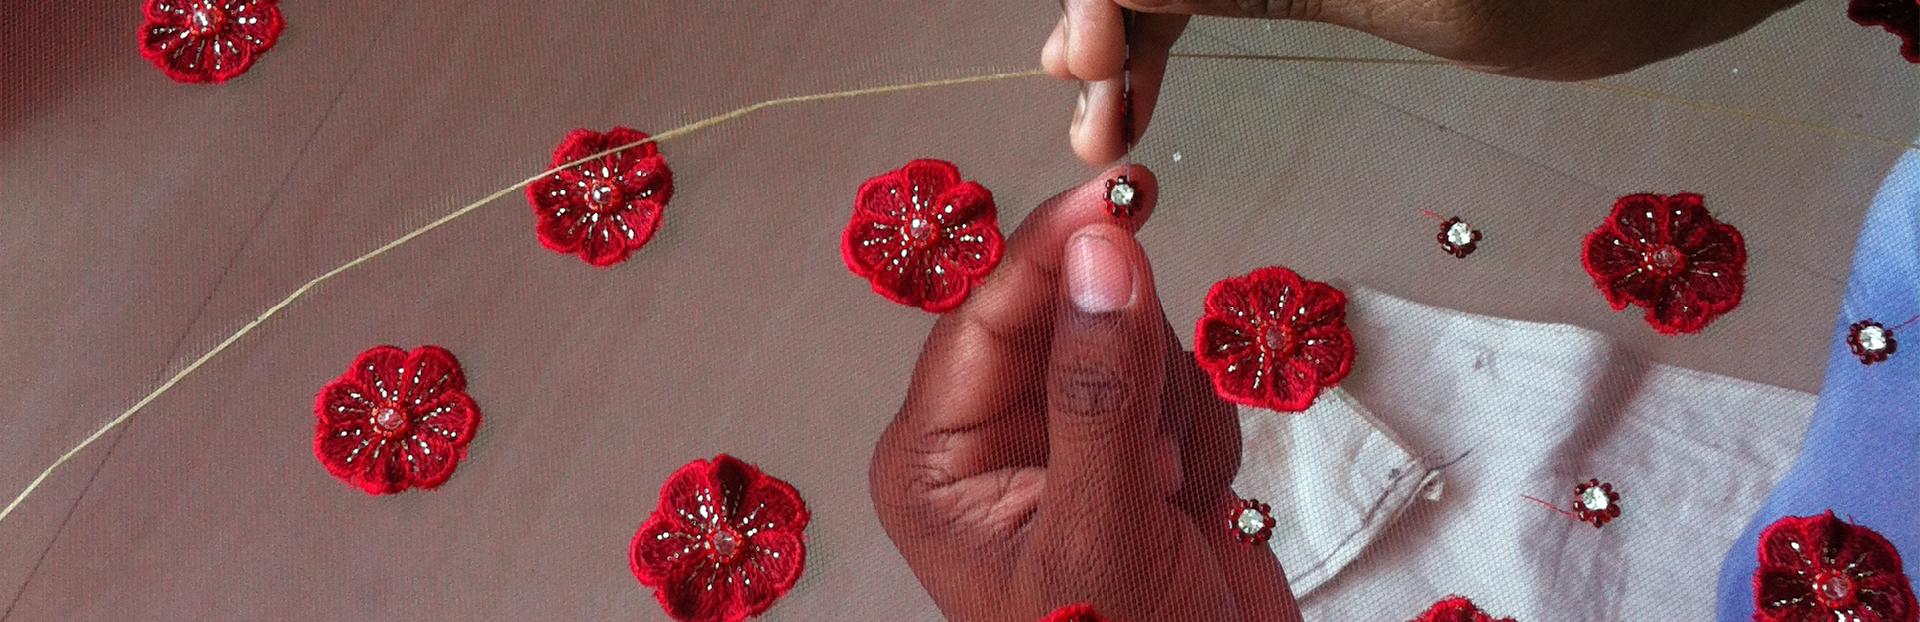 Neeva - Artisinal Craftsmanship